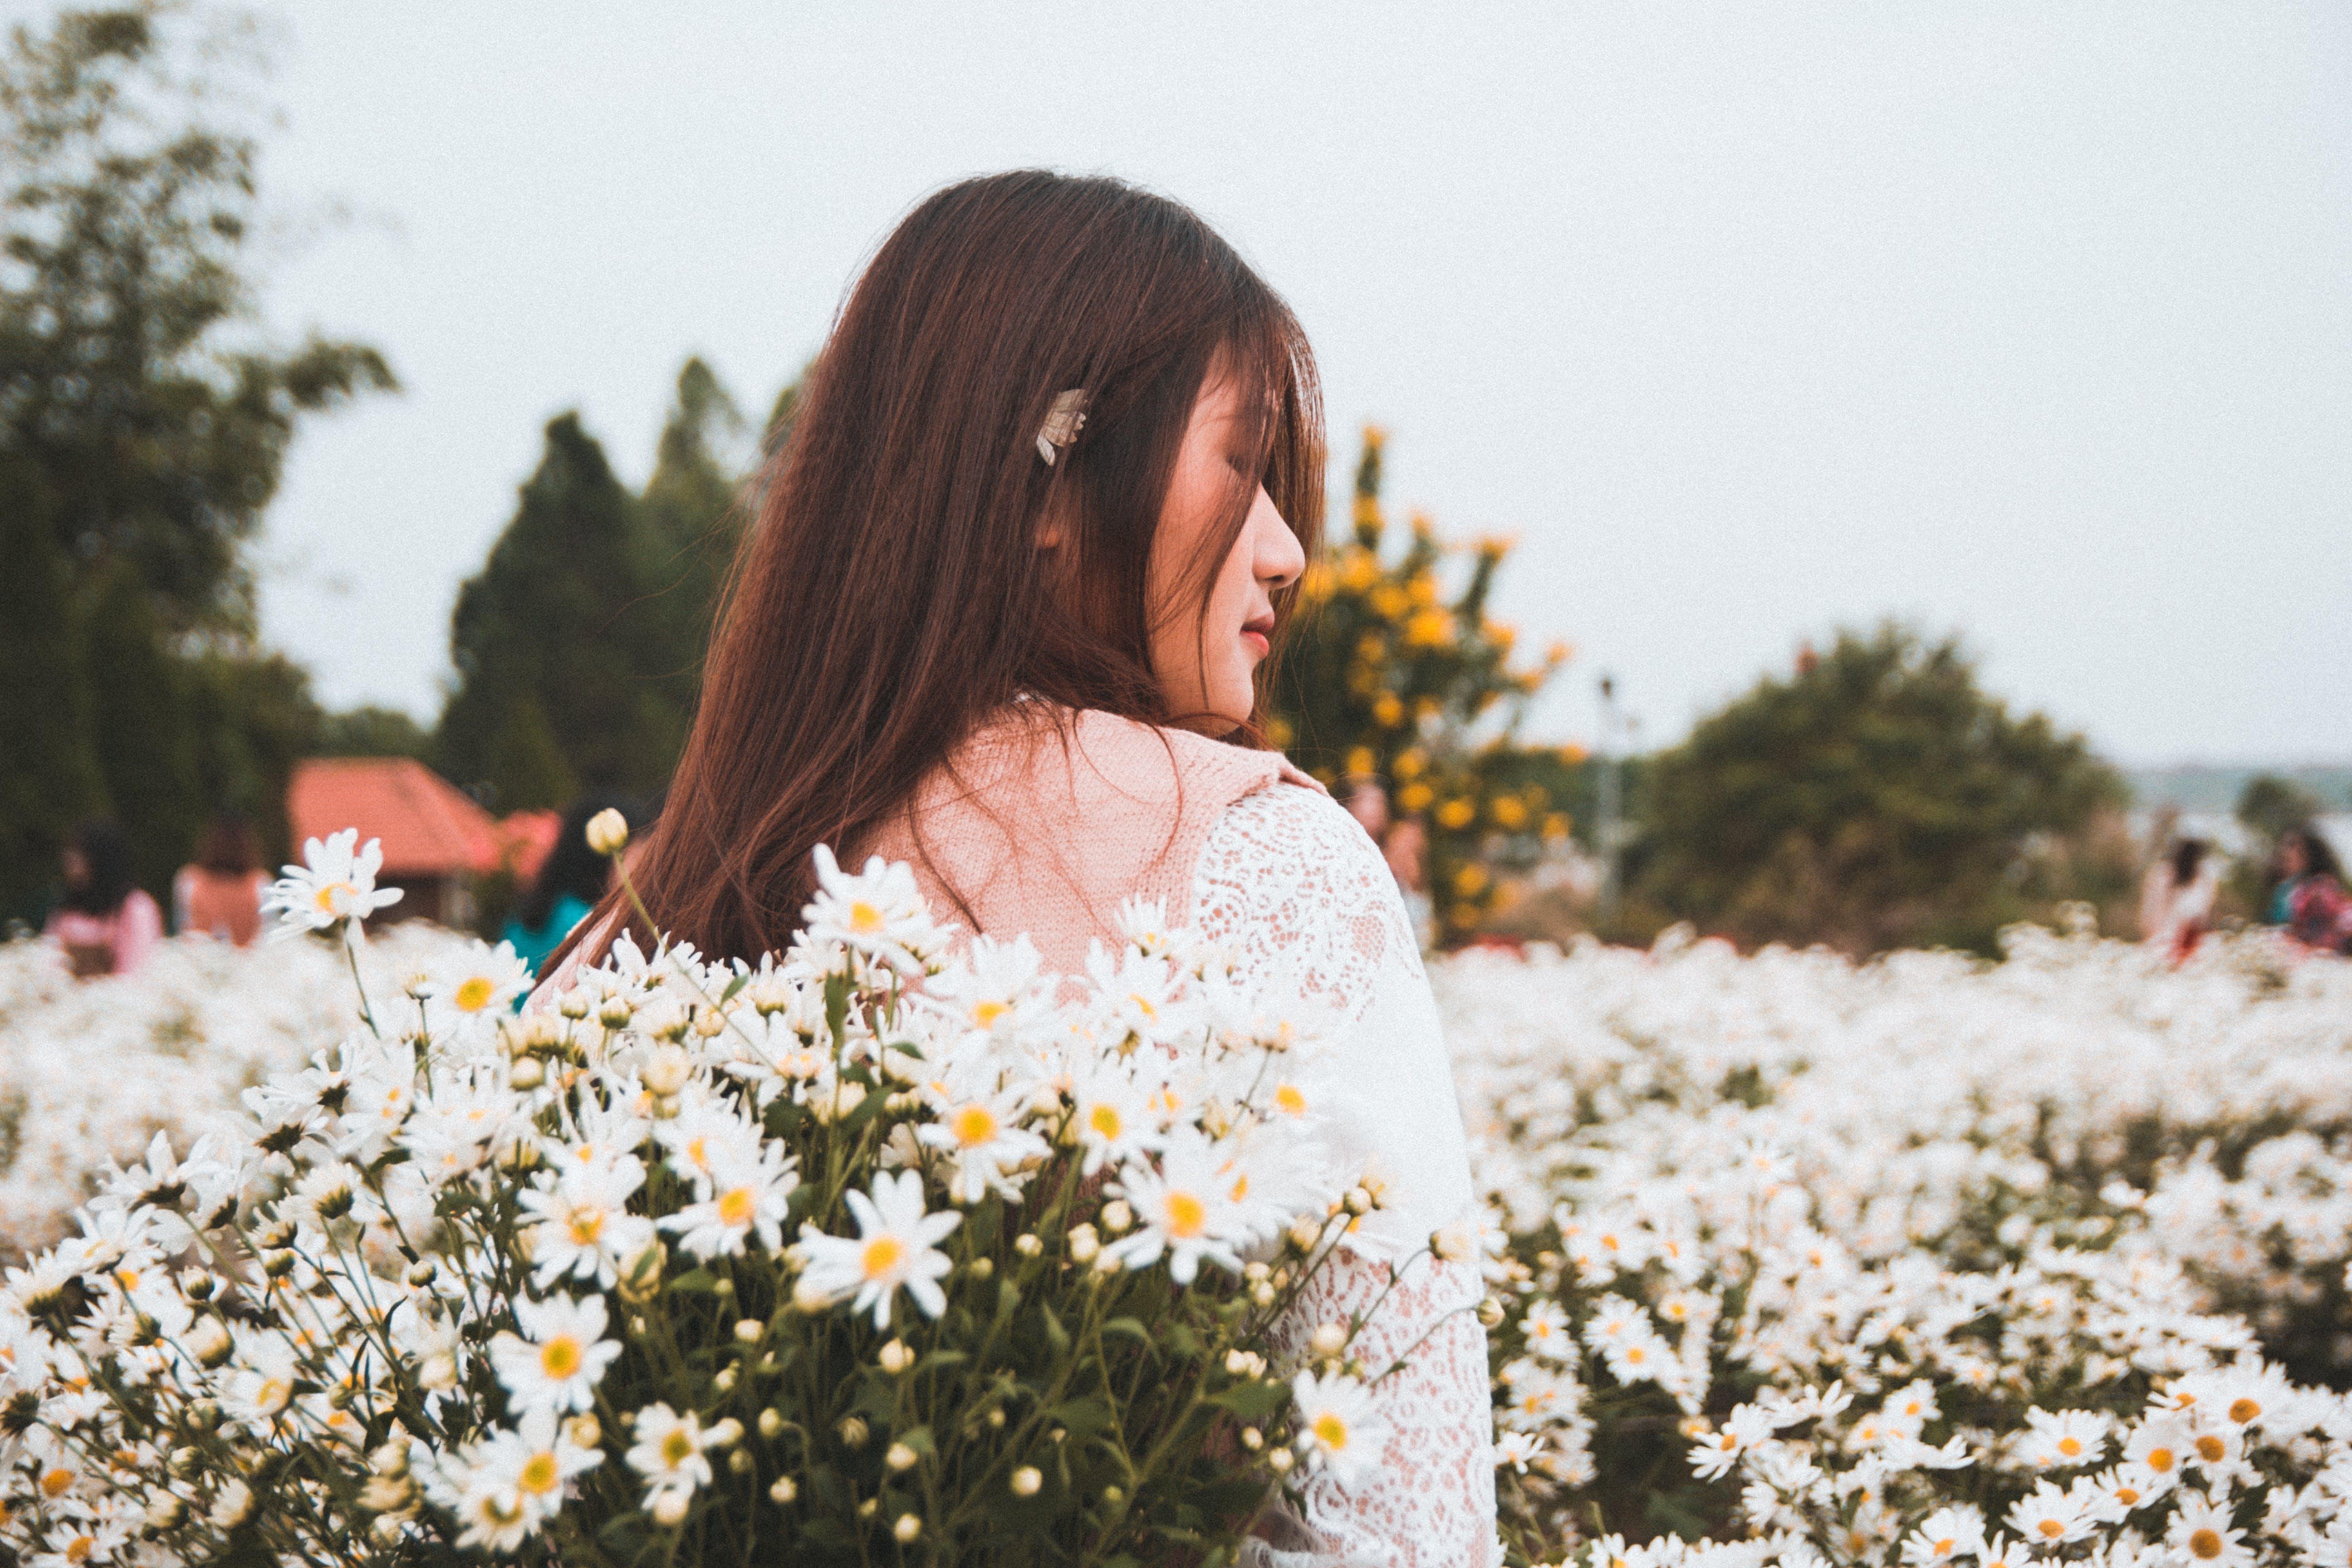 Woman Standing Near White Daisy Flowers